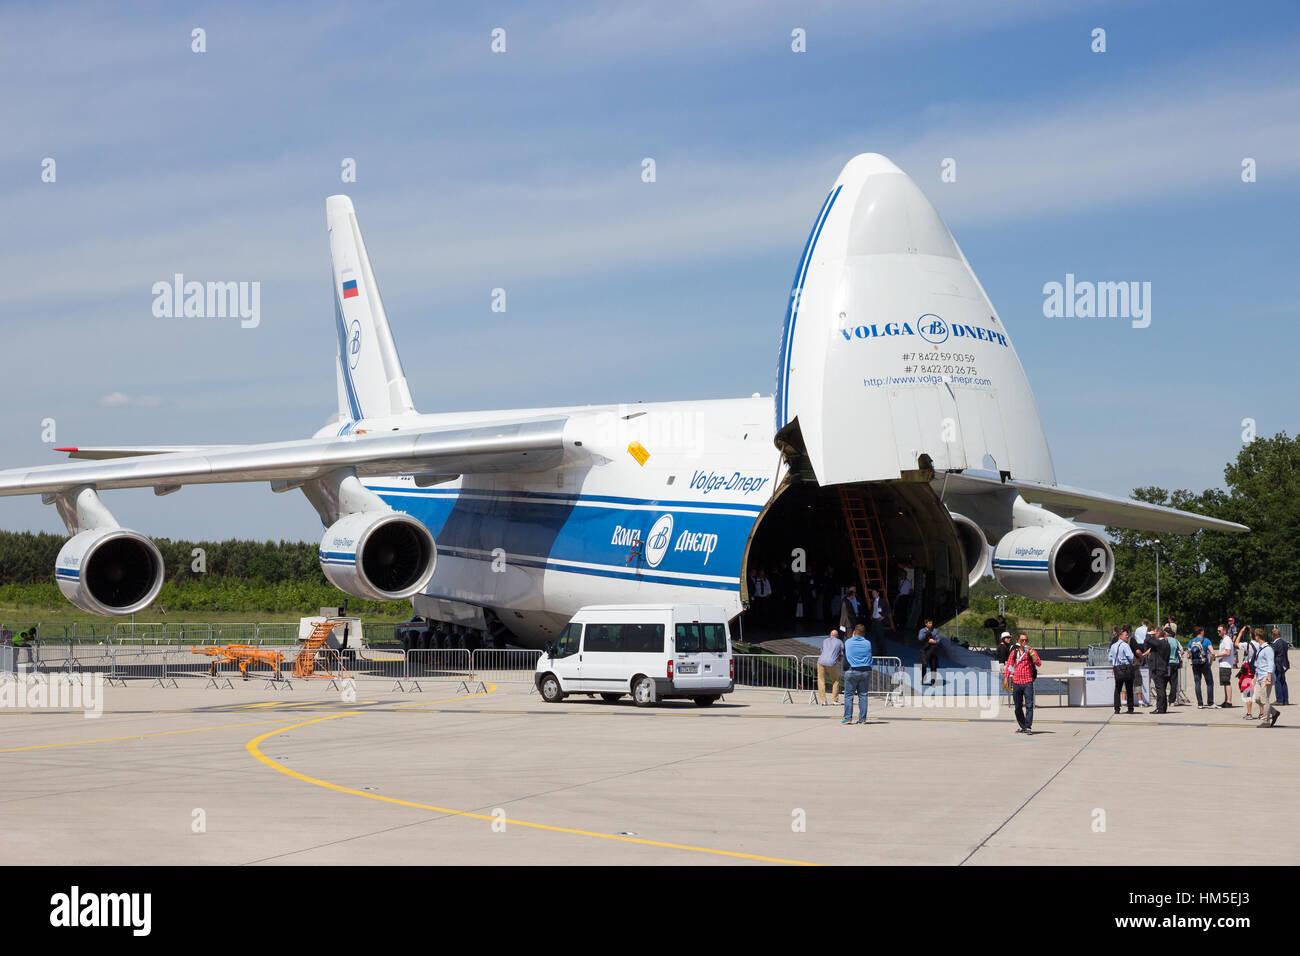 BERLIN, GERMANY - MAY 22, 2014: Russian made Antonov An-124 transport plane at the International Aerospace Exhibition - Stock Image